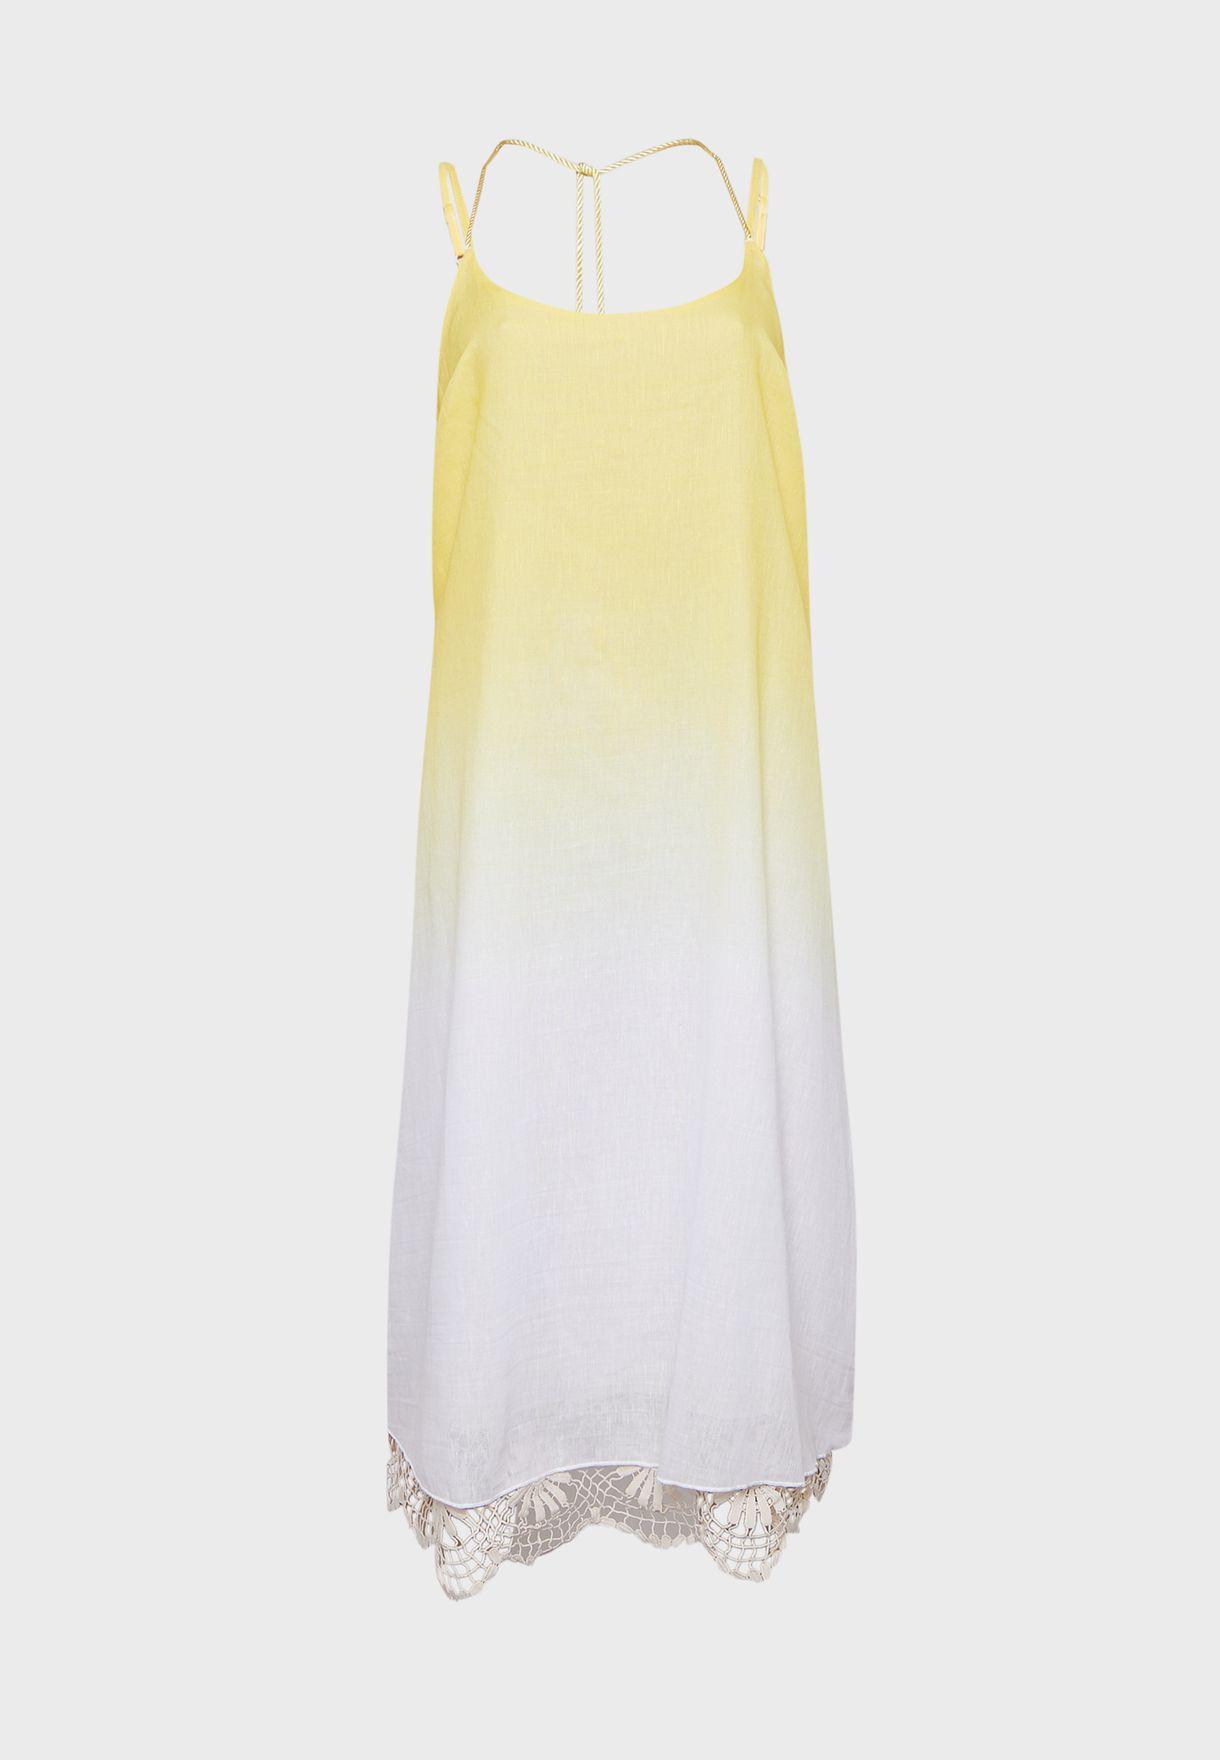 Ombre Crochet Midi Beach Dress